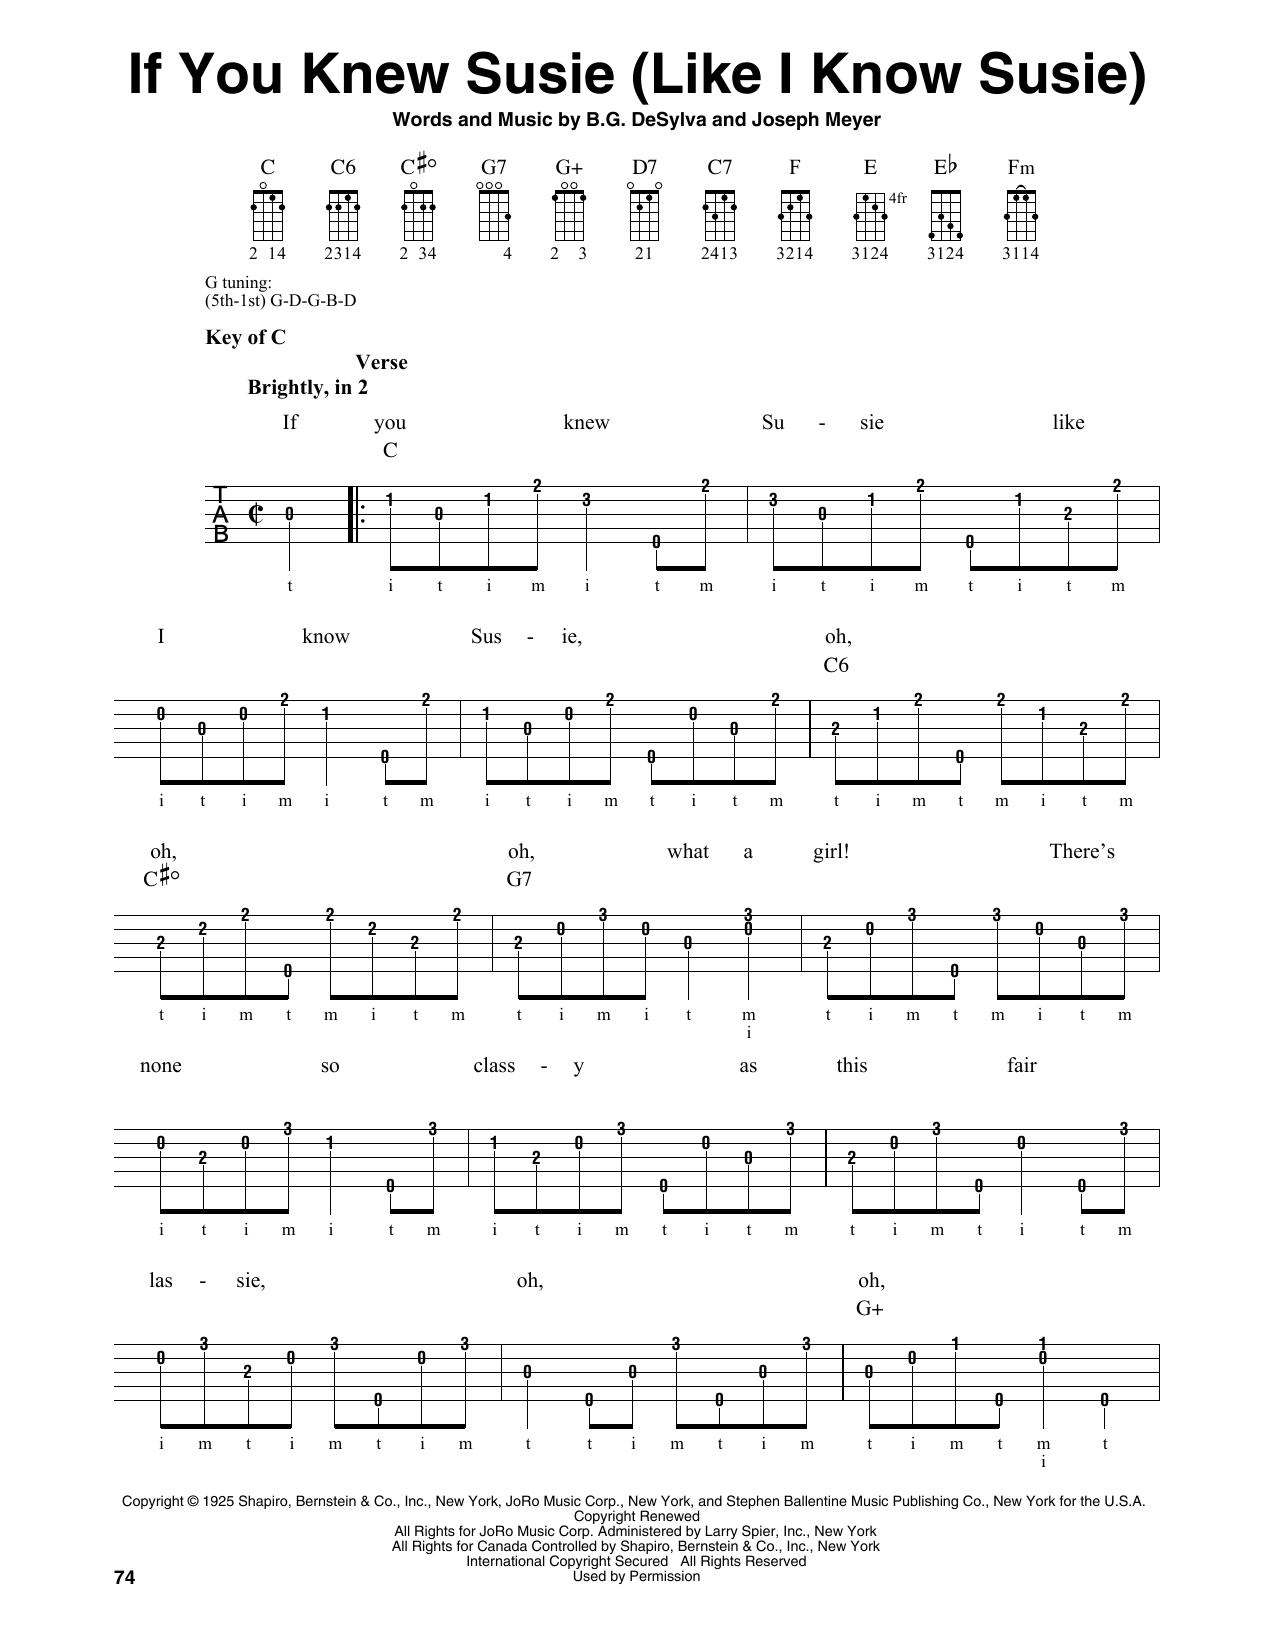 If You Knew Susie (Like I Know Susie) (Banjo Tab)